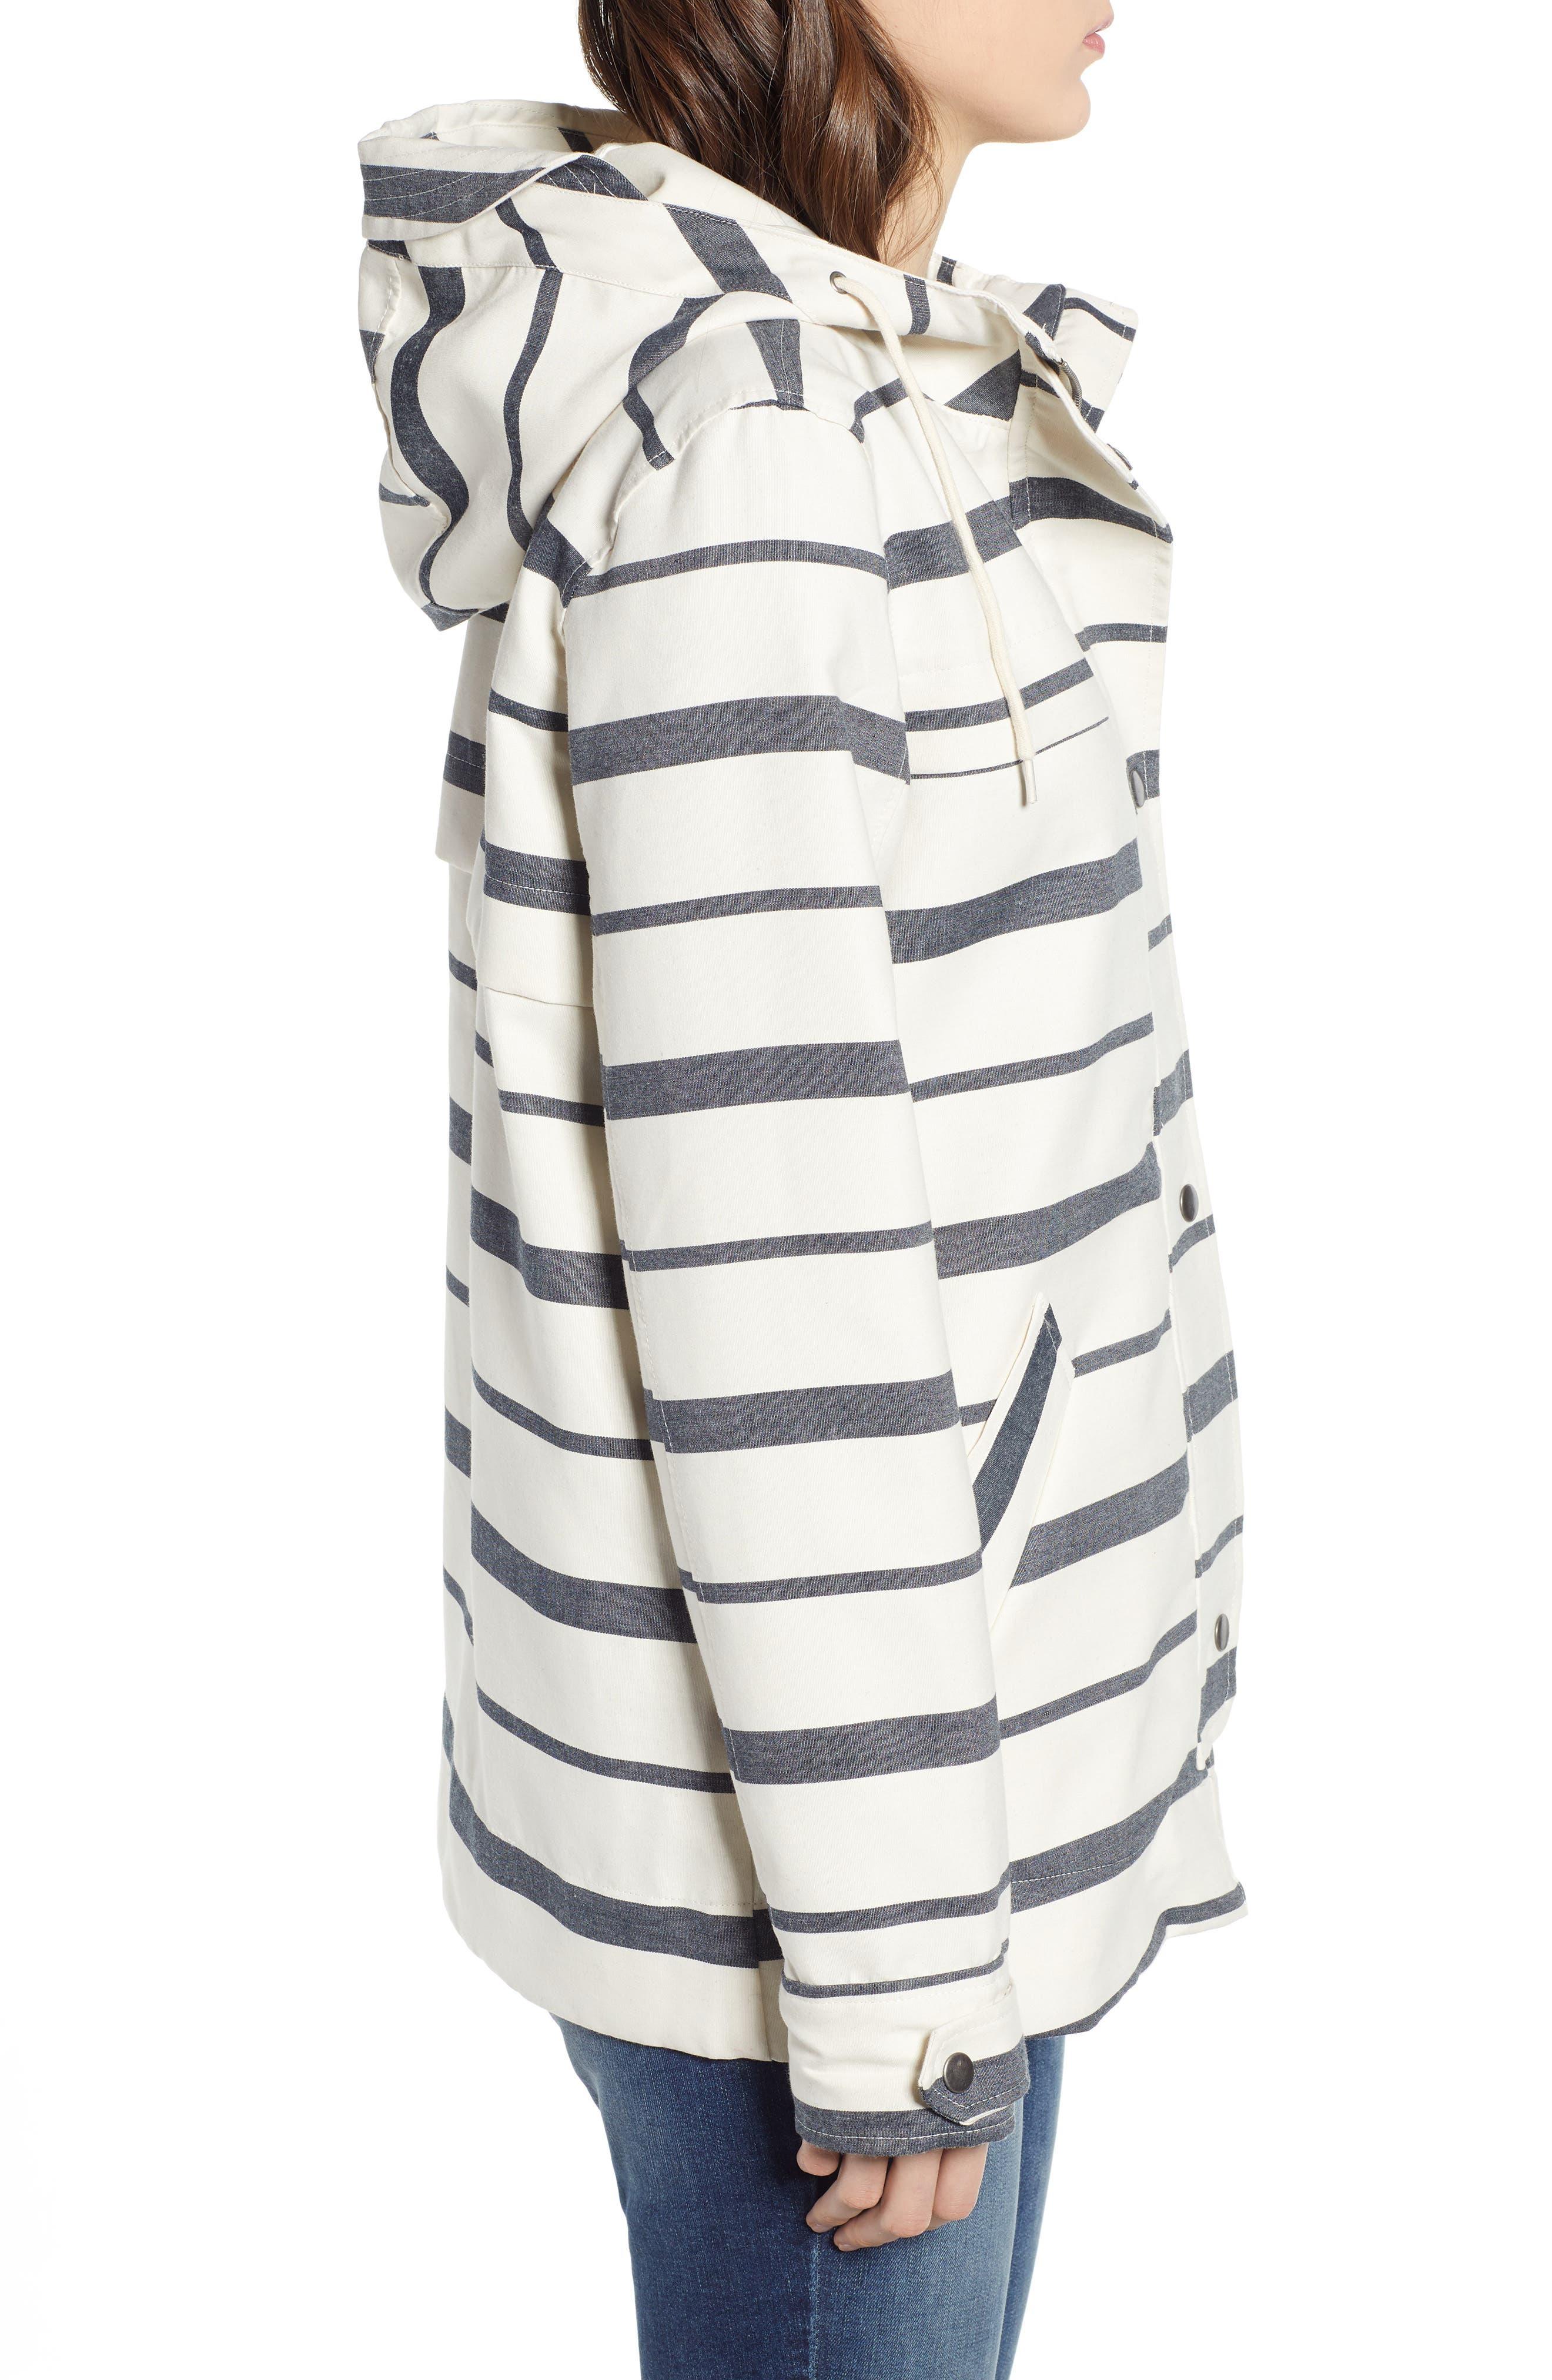 THREAD & SUPPLY, Portside Rain Jacket, Alternate thumbnail 3, color, BLACK WHITE STRIPE